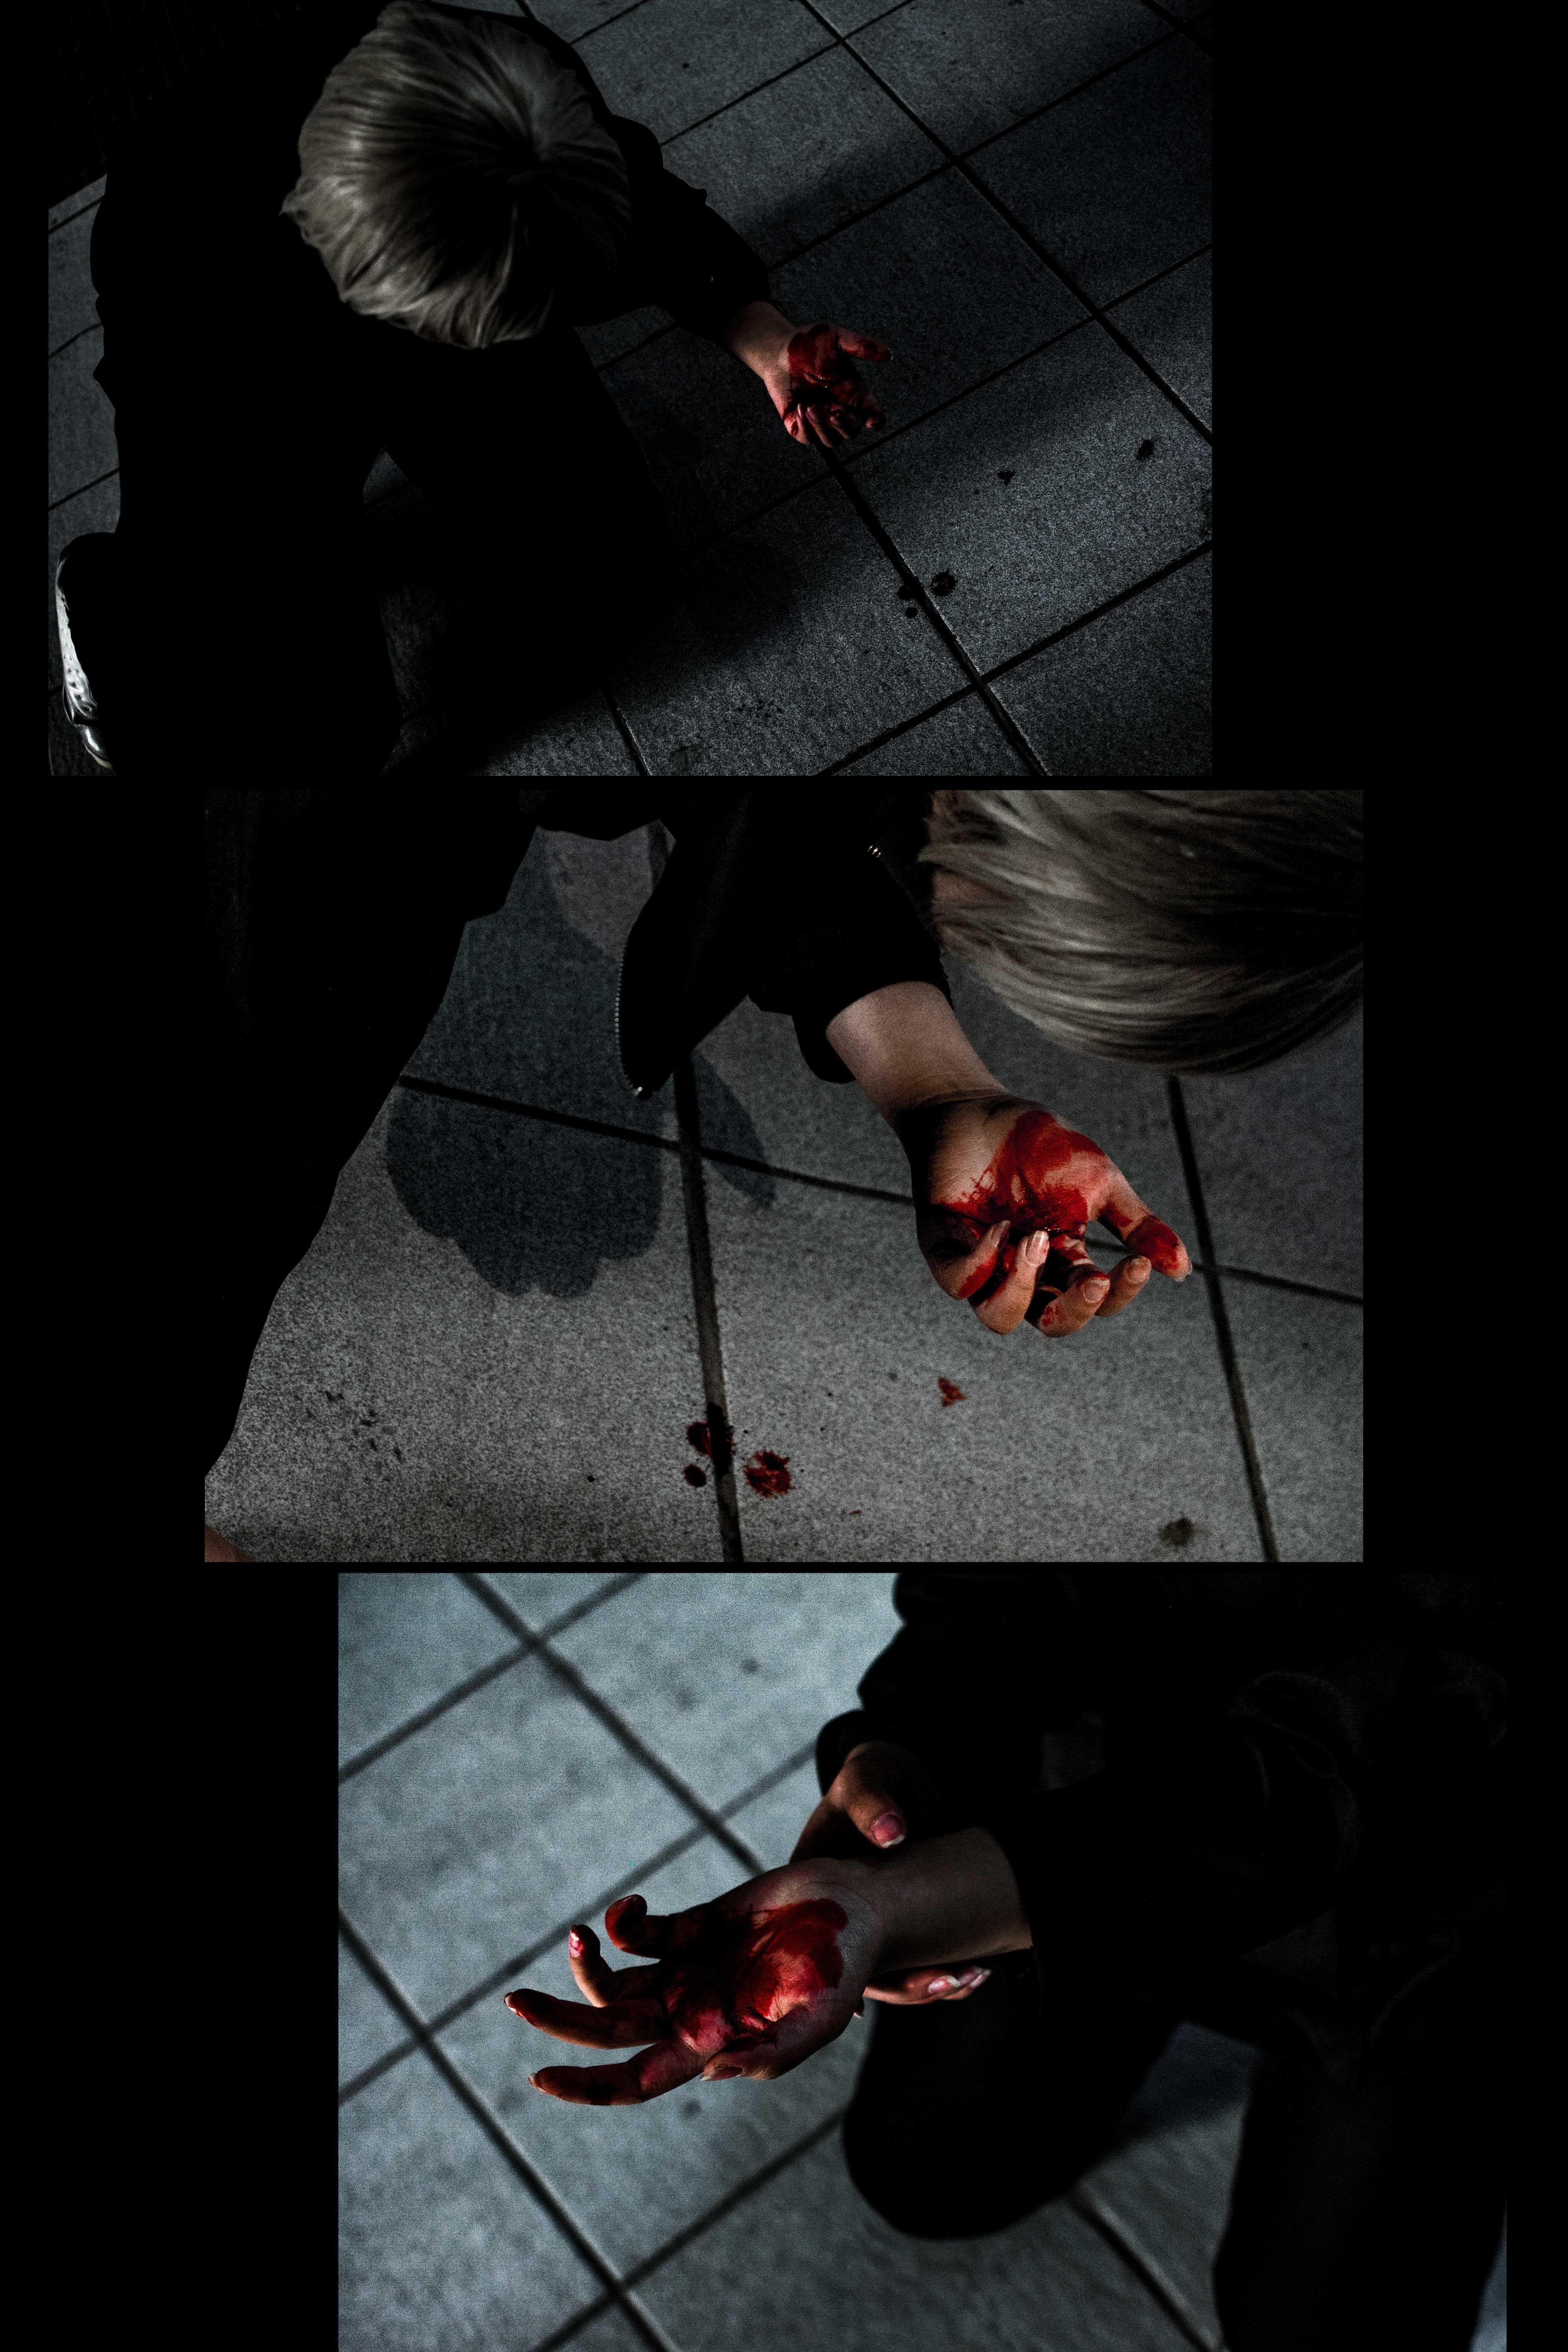 《咒术回战》银杉GINsugicosplay-第1张